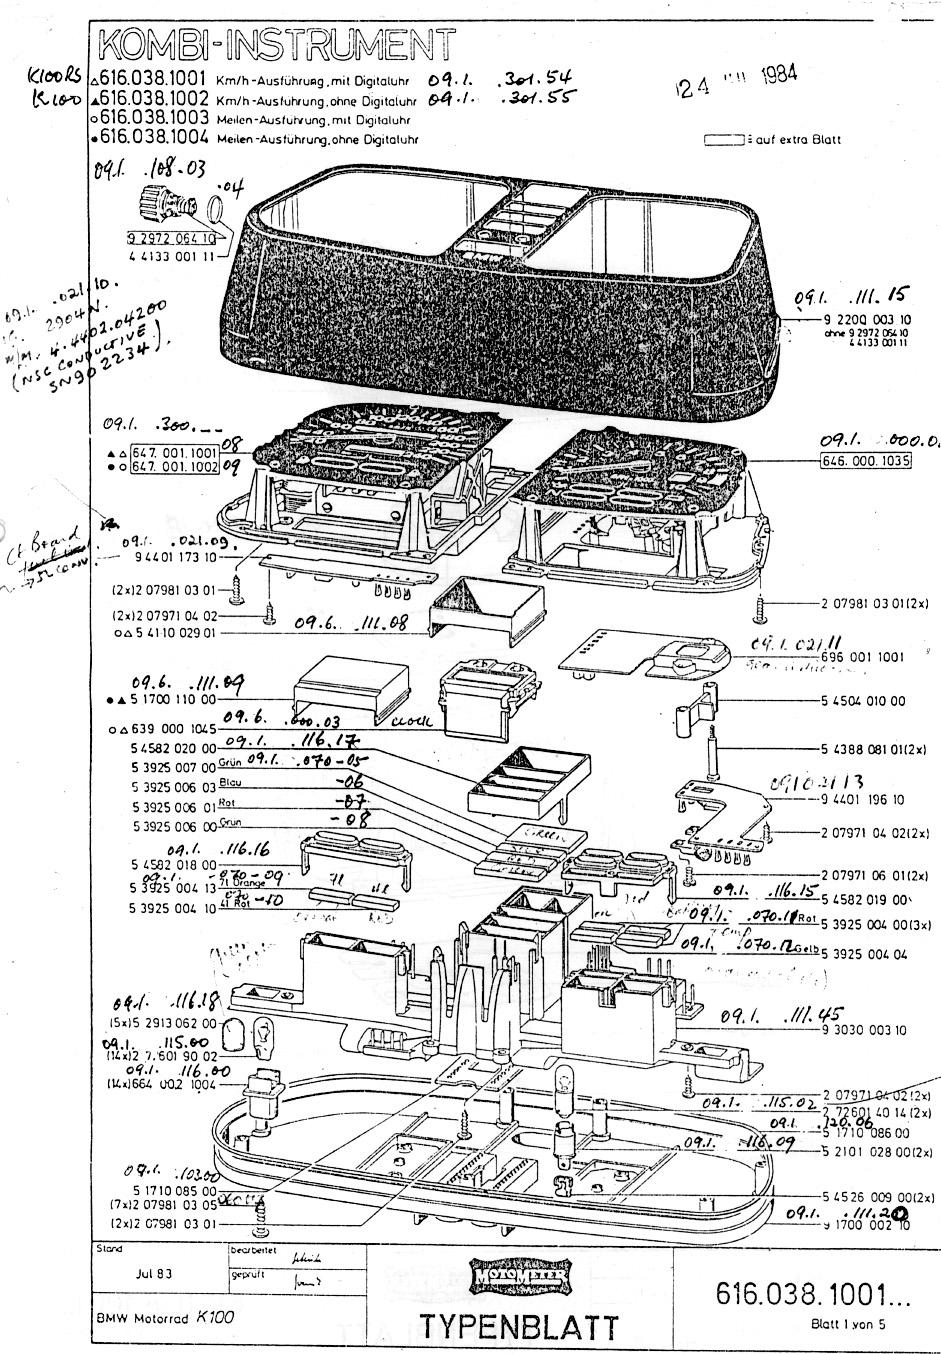 diagram k bike wiring diagrams file nj47341 1991 bmw k100rs 1985 bmw k100 wiring diagram 1985